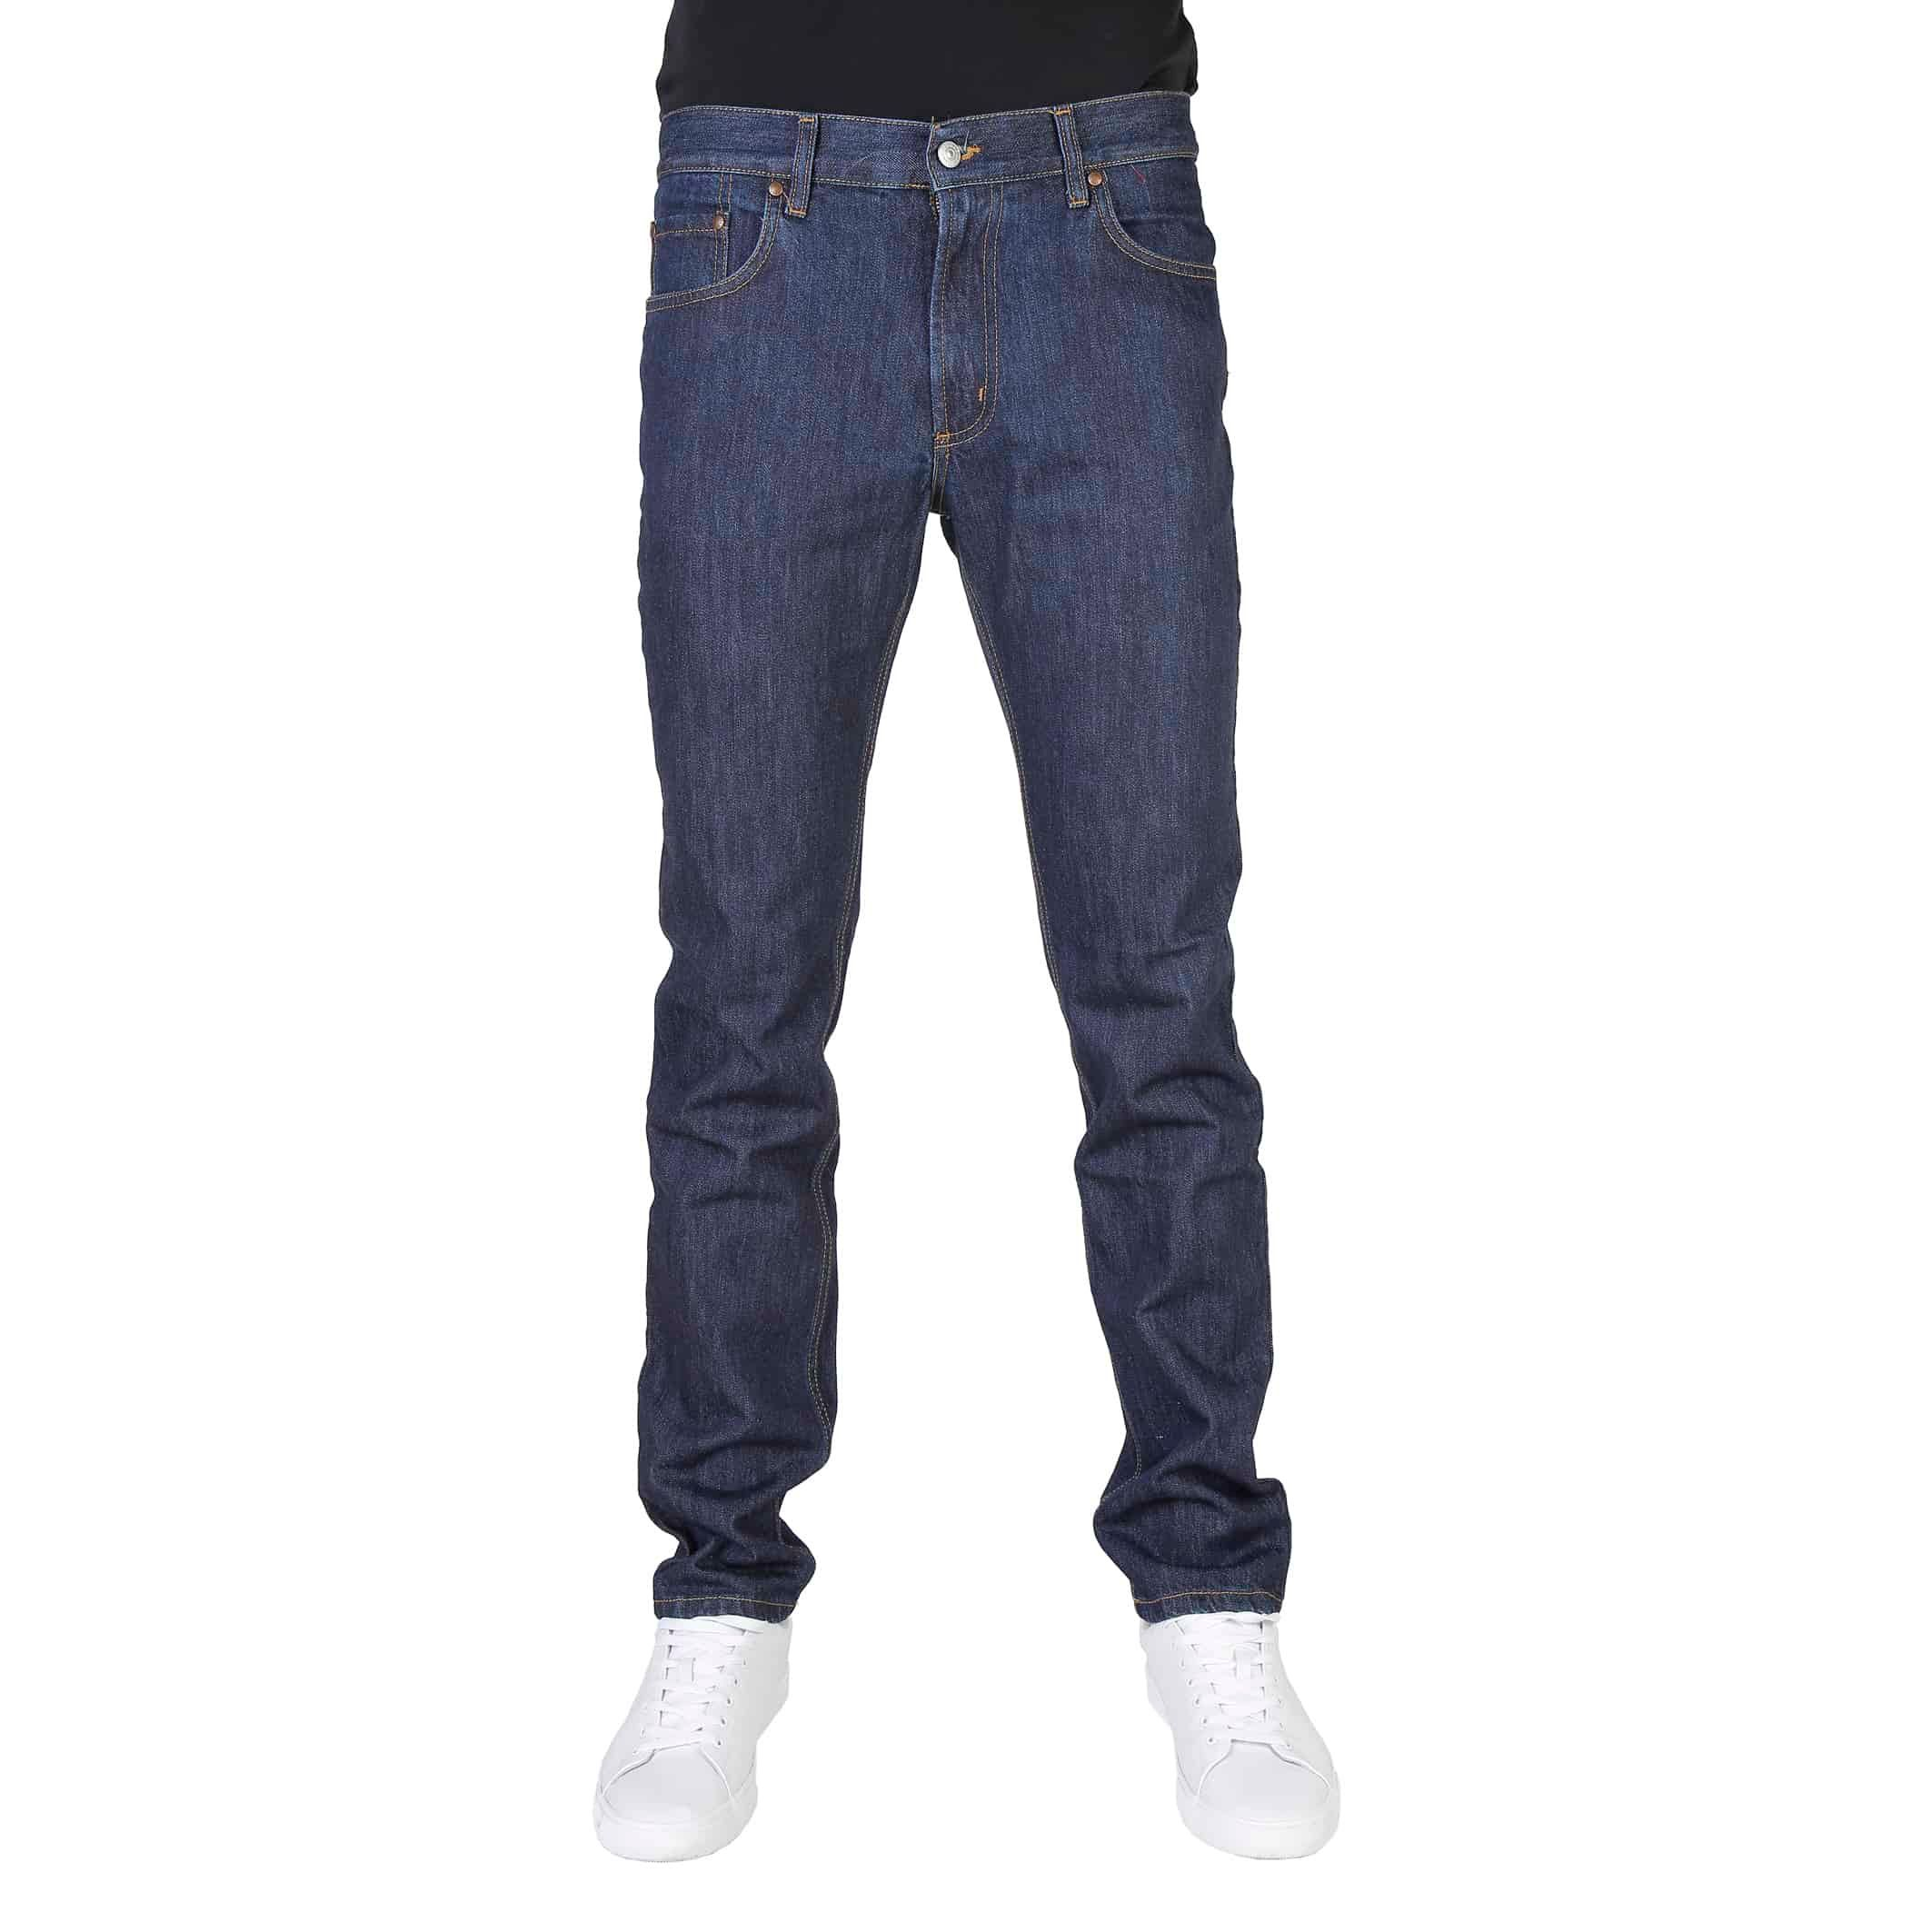 Carrera Jeans - 000700_01021